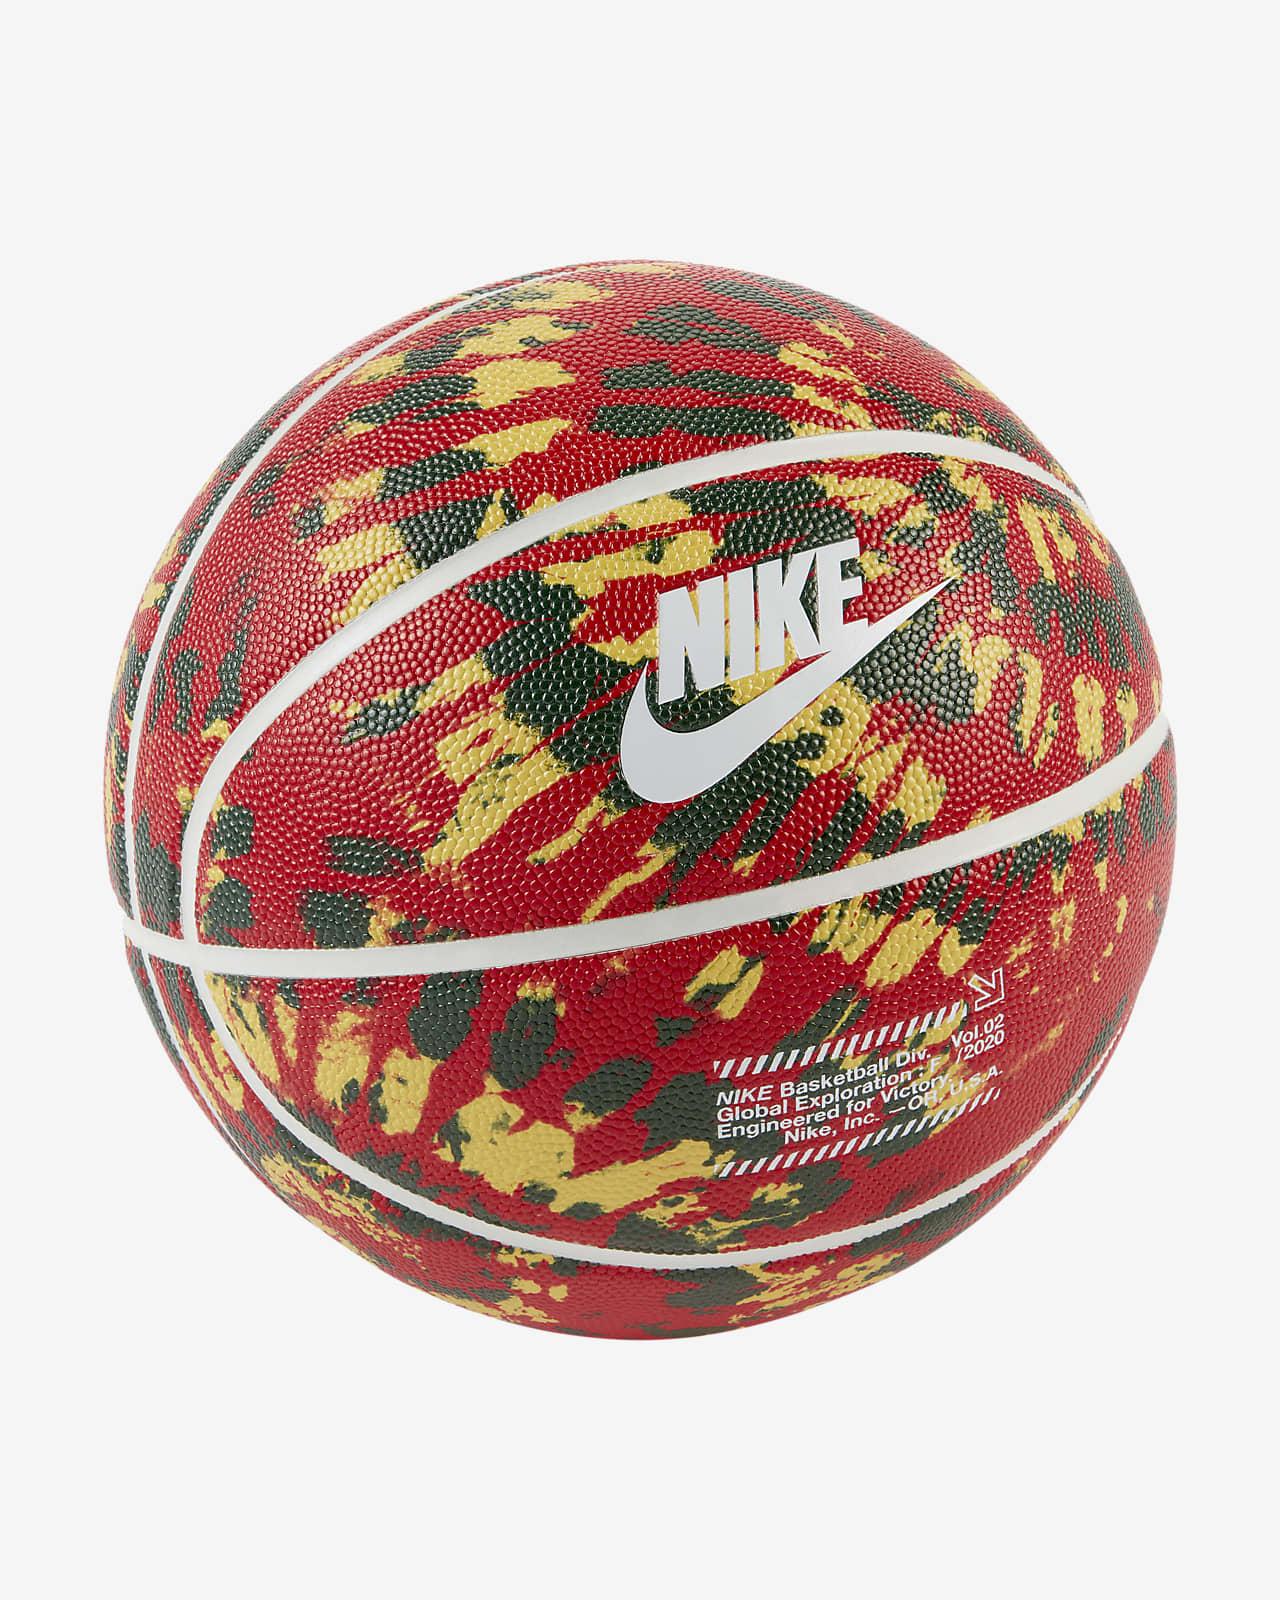 Nike Global Exploration West Basketball